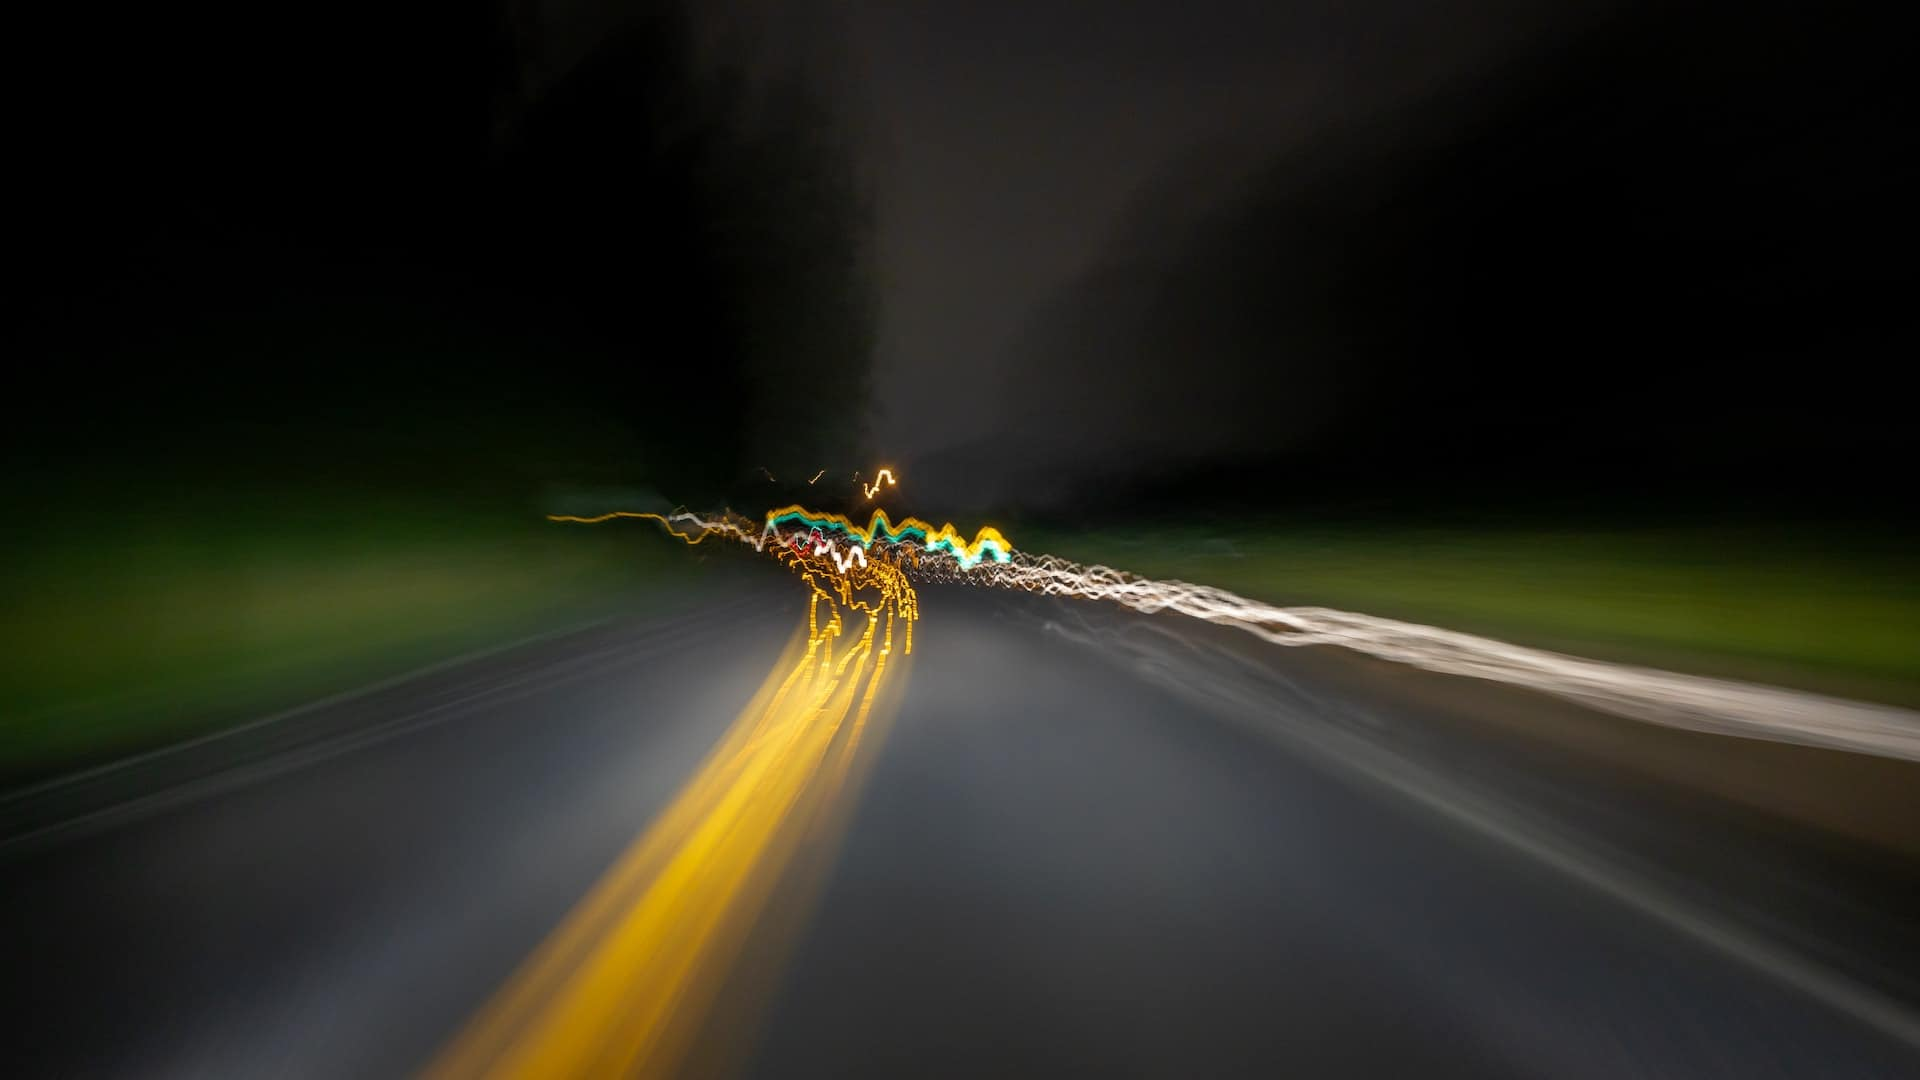 Blurry highway image